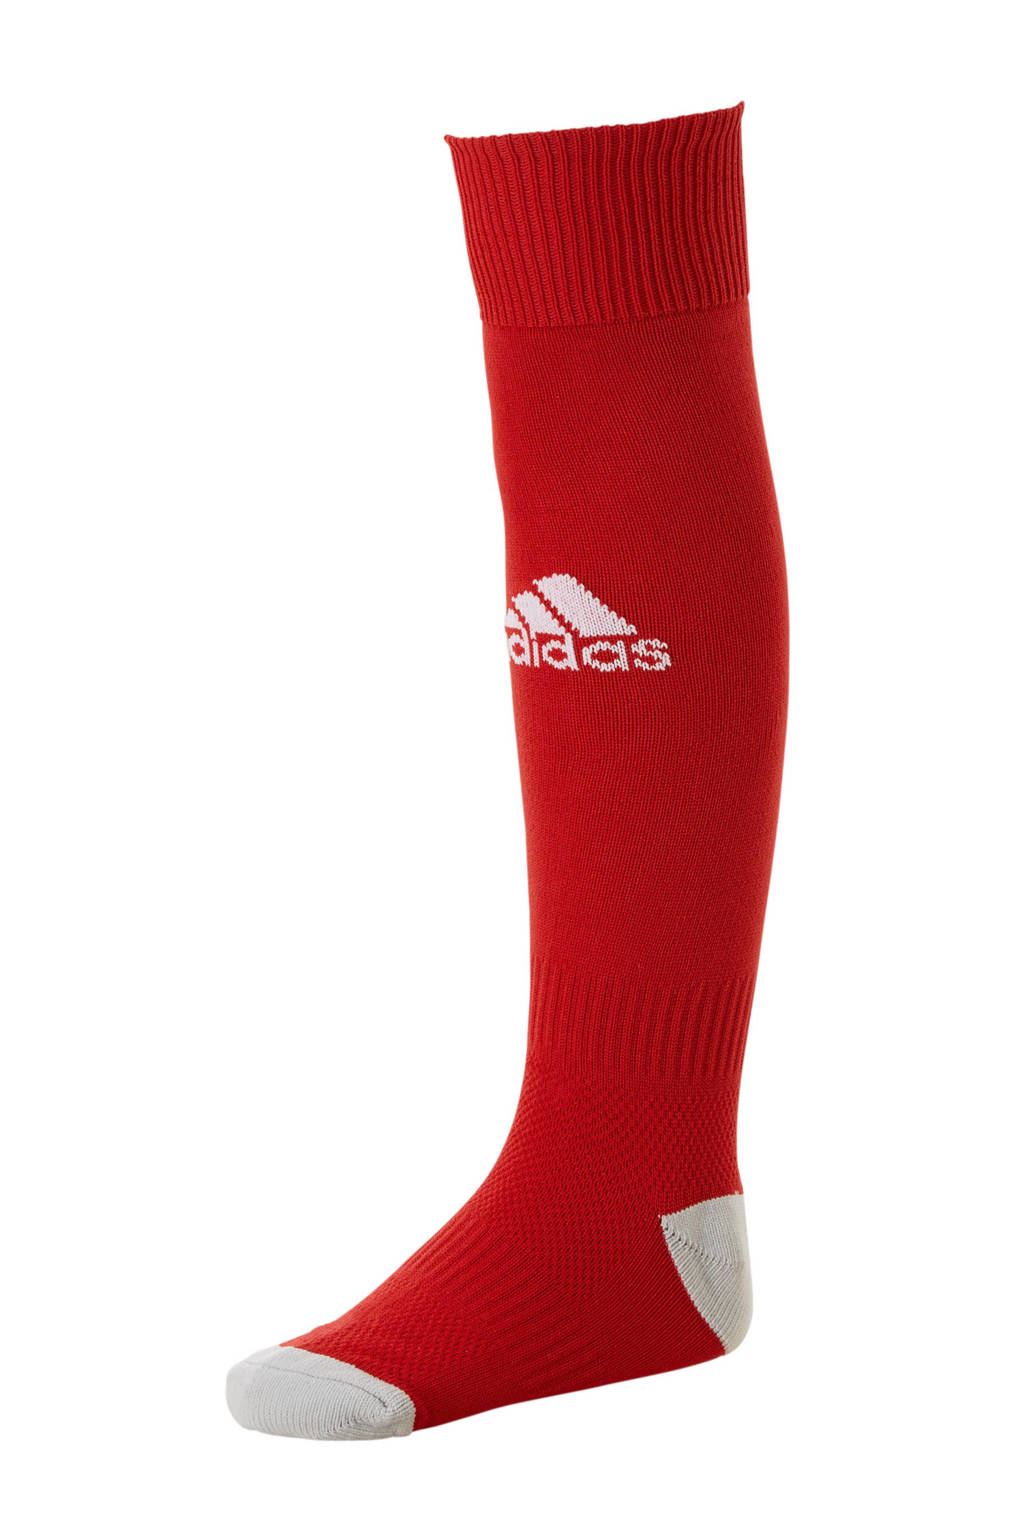 adidas Junior  Milano 16 voetbalsokken rood, Rood/lichtgrijs